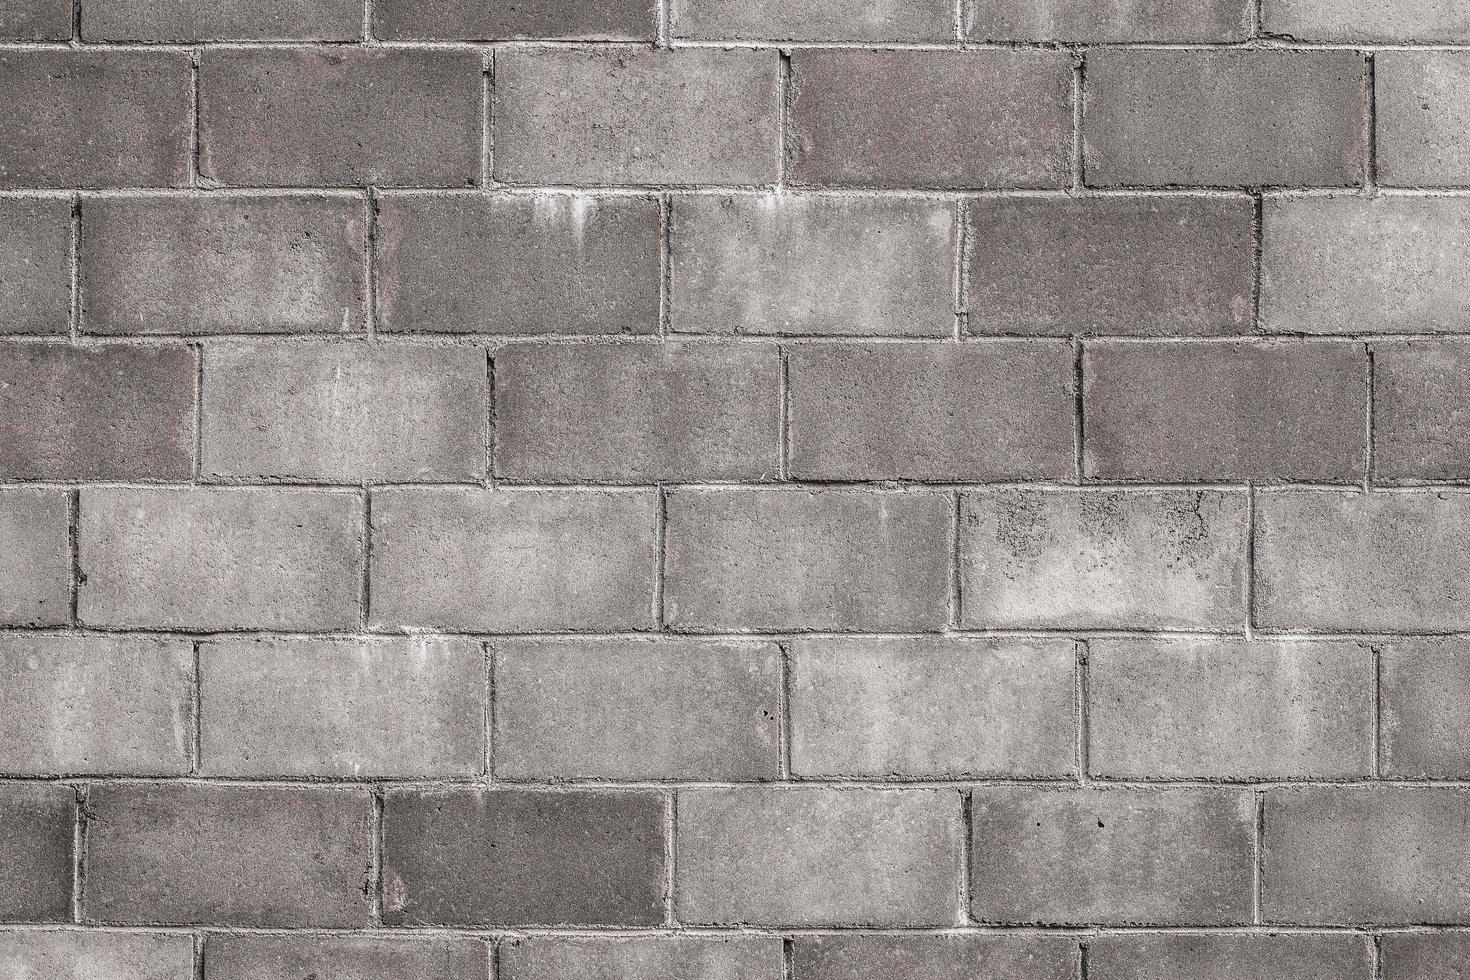 oude betonnen blokmuur foto